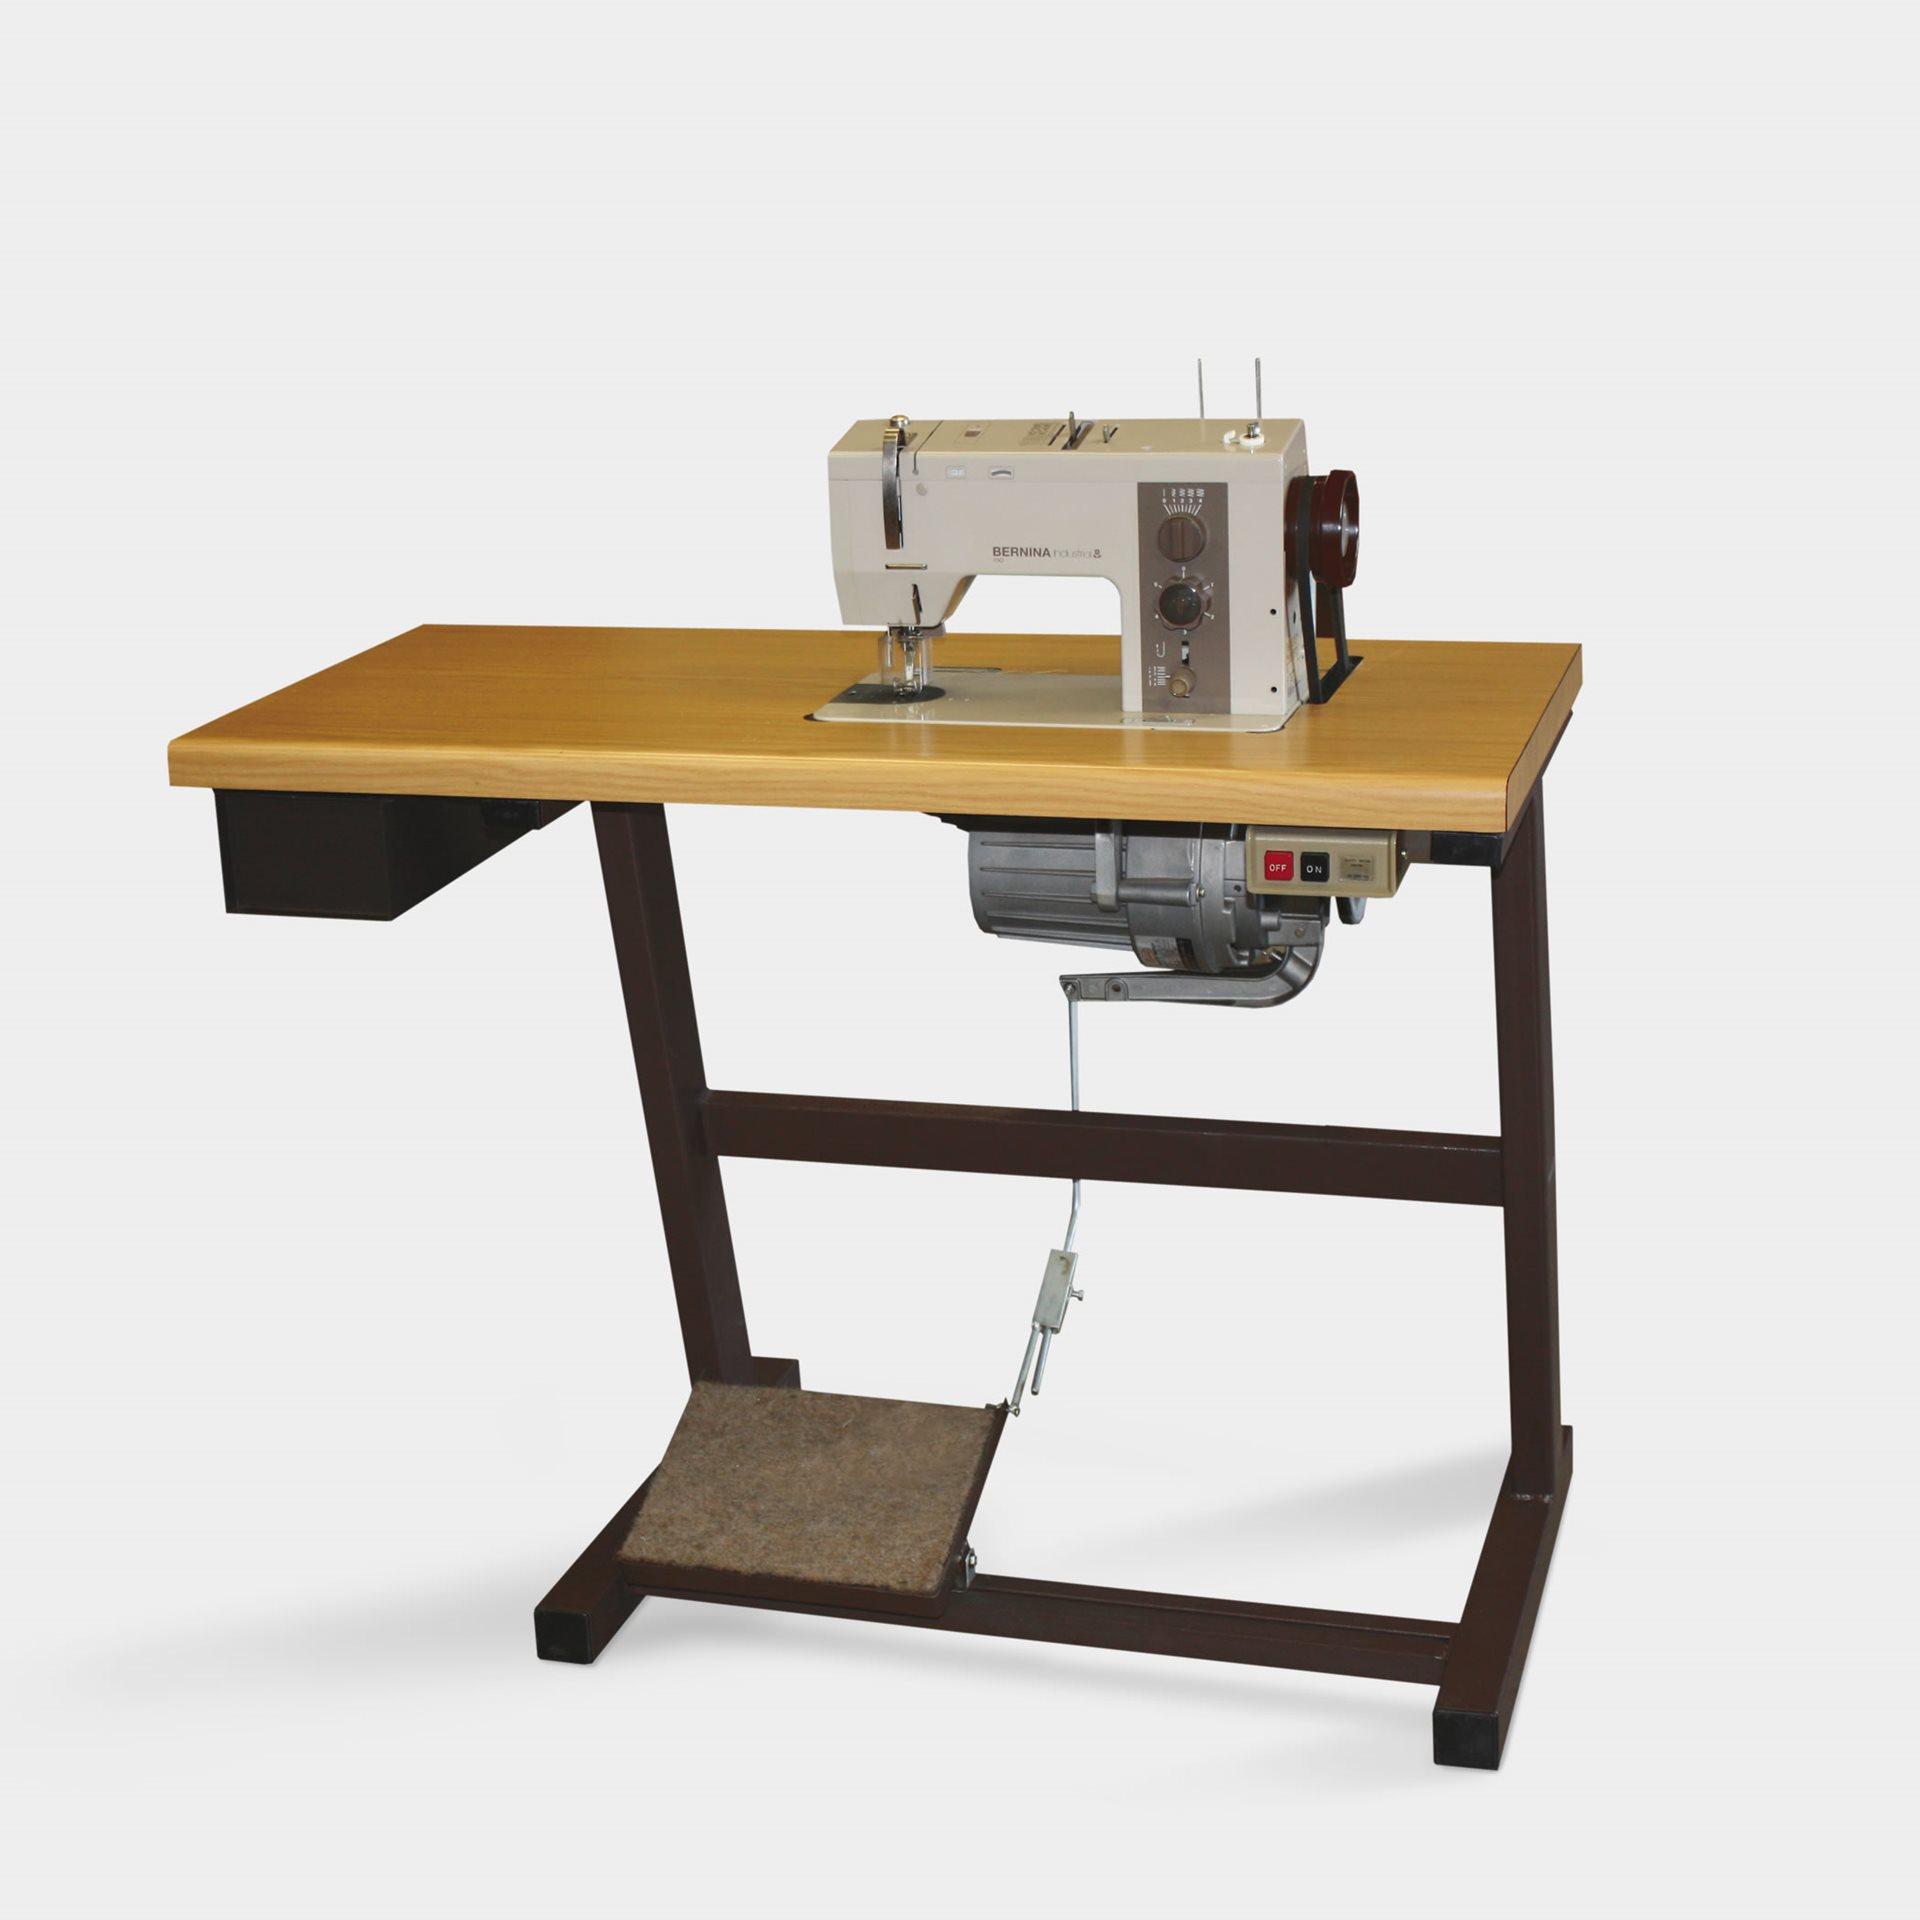 bernina 950 industrial une machine coudre m canique. Black Bedroom Furniture Sets. Home Design Ideas